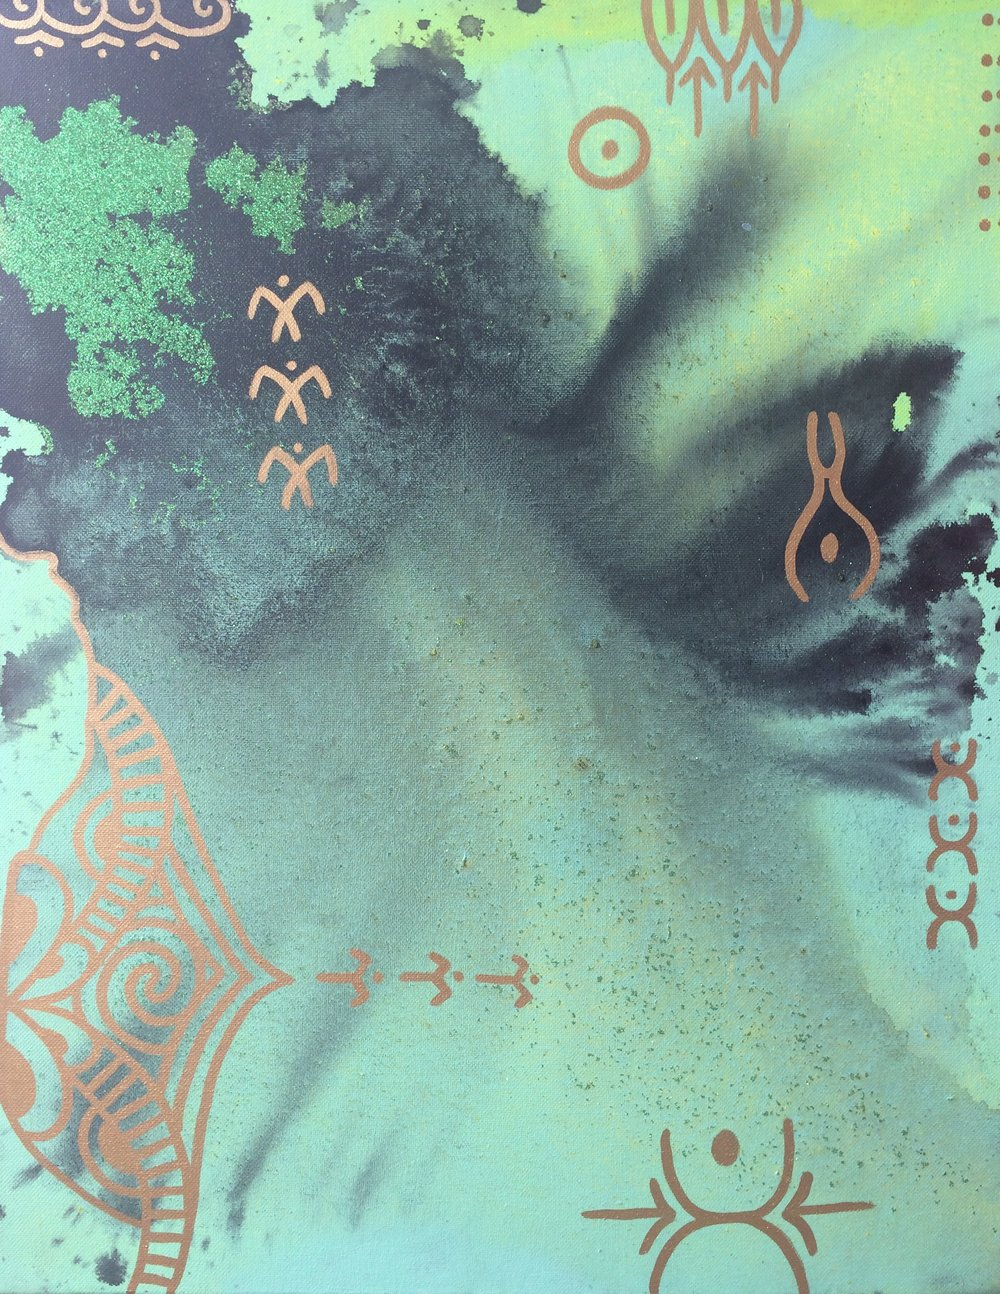 DIVINE ORIGINS I 41cmx50cm 2017 Taryn Beri original framed canvas acrylic .jpg